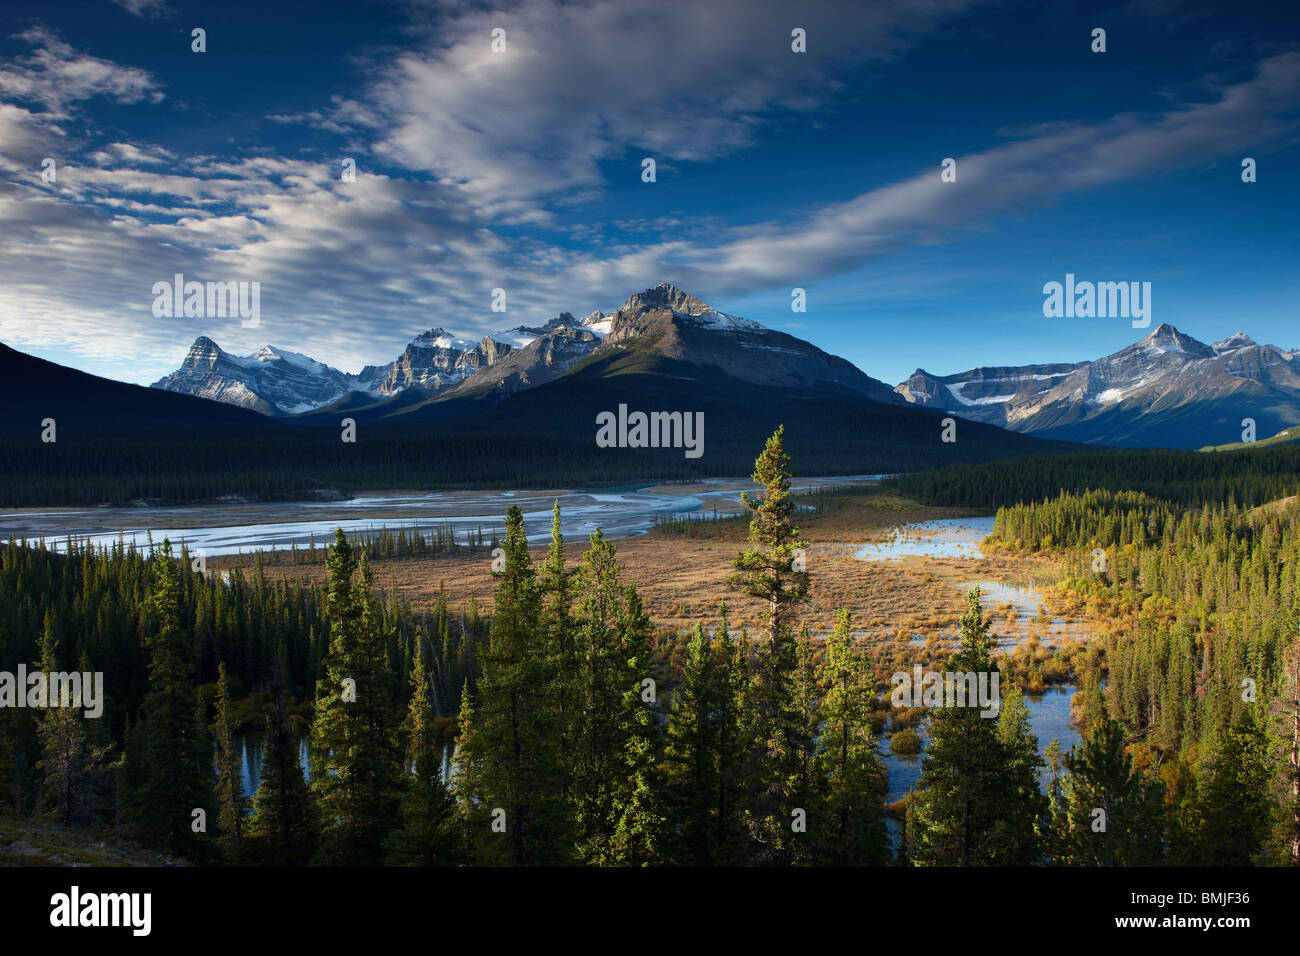 the Howse River and Waputik Mountains, Saskatchewan Crossing, Banff National Park, Alberta, Canada - Stock Image